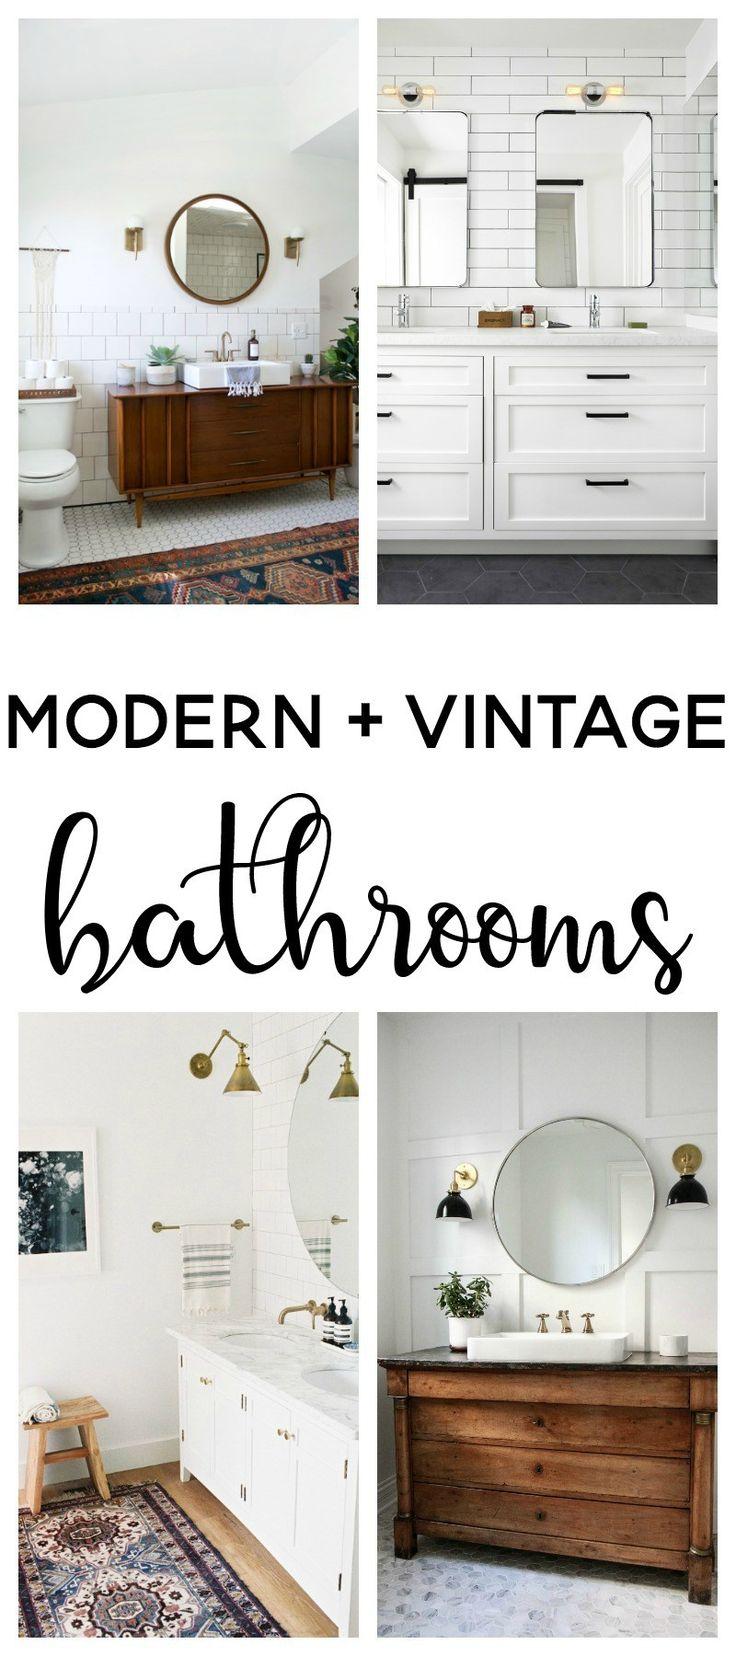 Modern Vintage Bathroom Inspiration – Bathroom Design